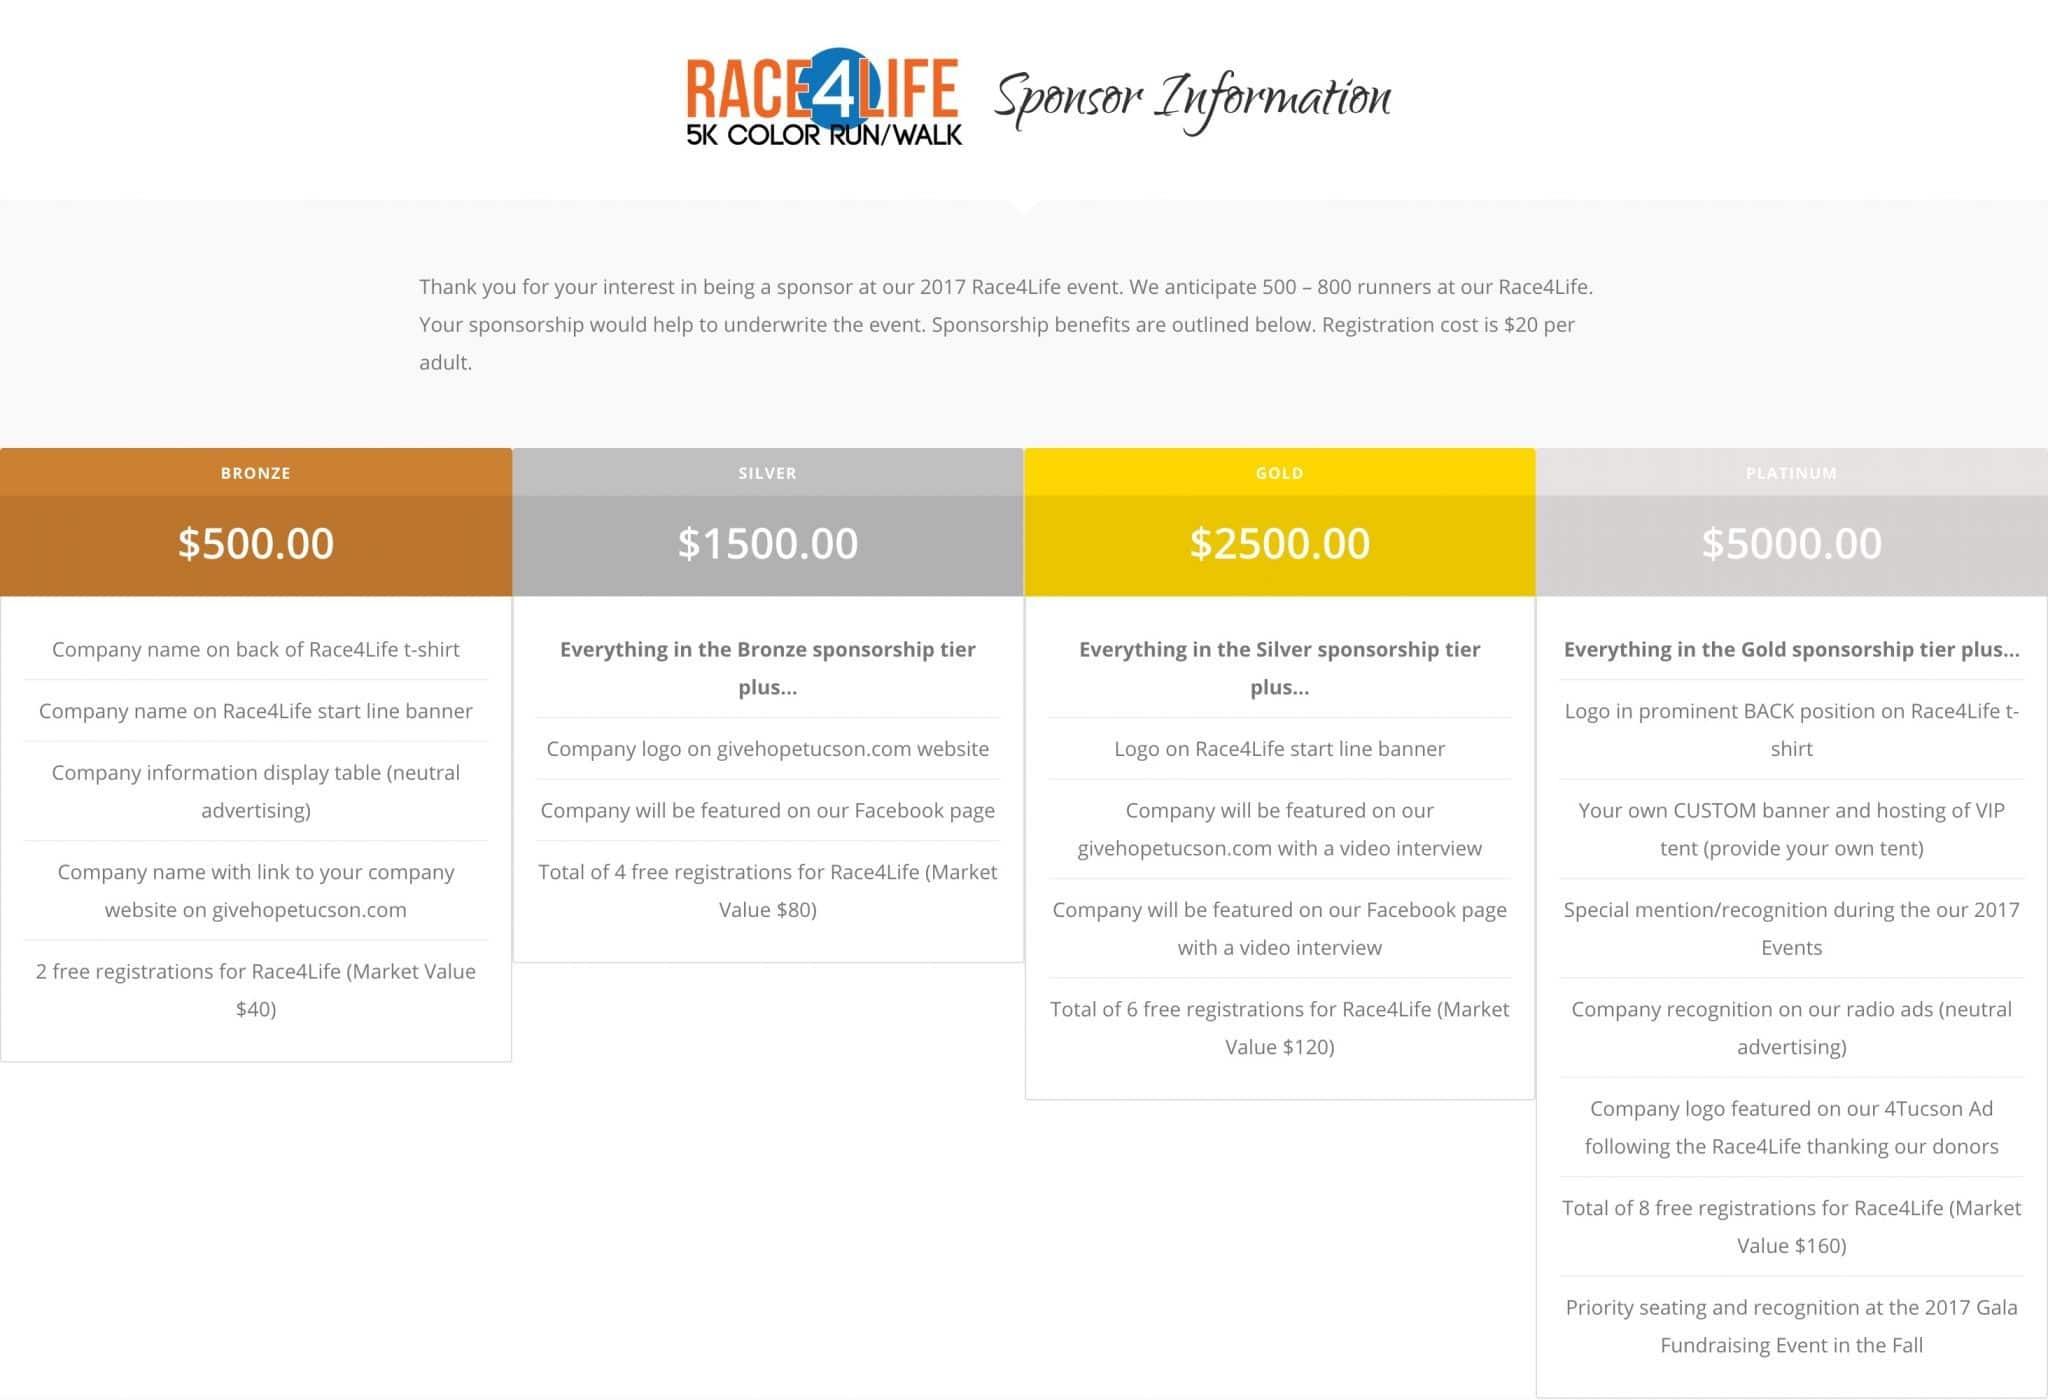 Race4Life-Business-Sponsorship-Information Materials